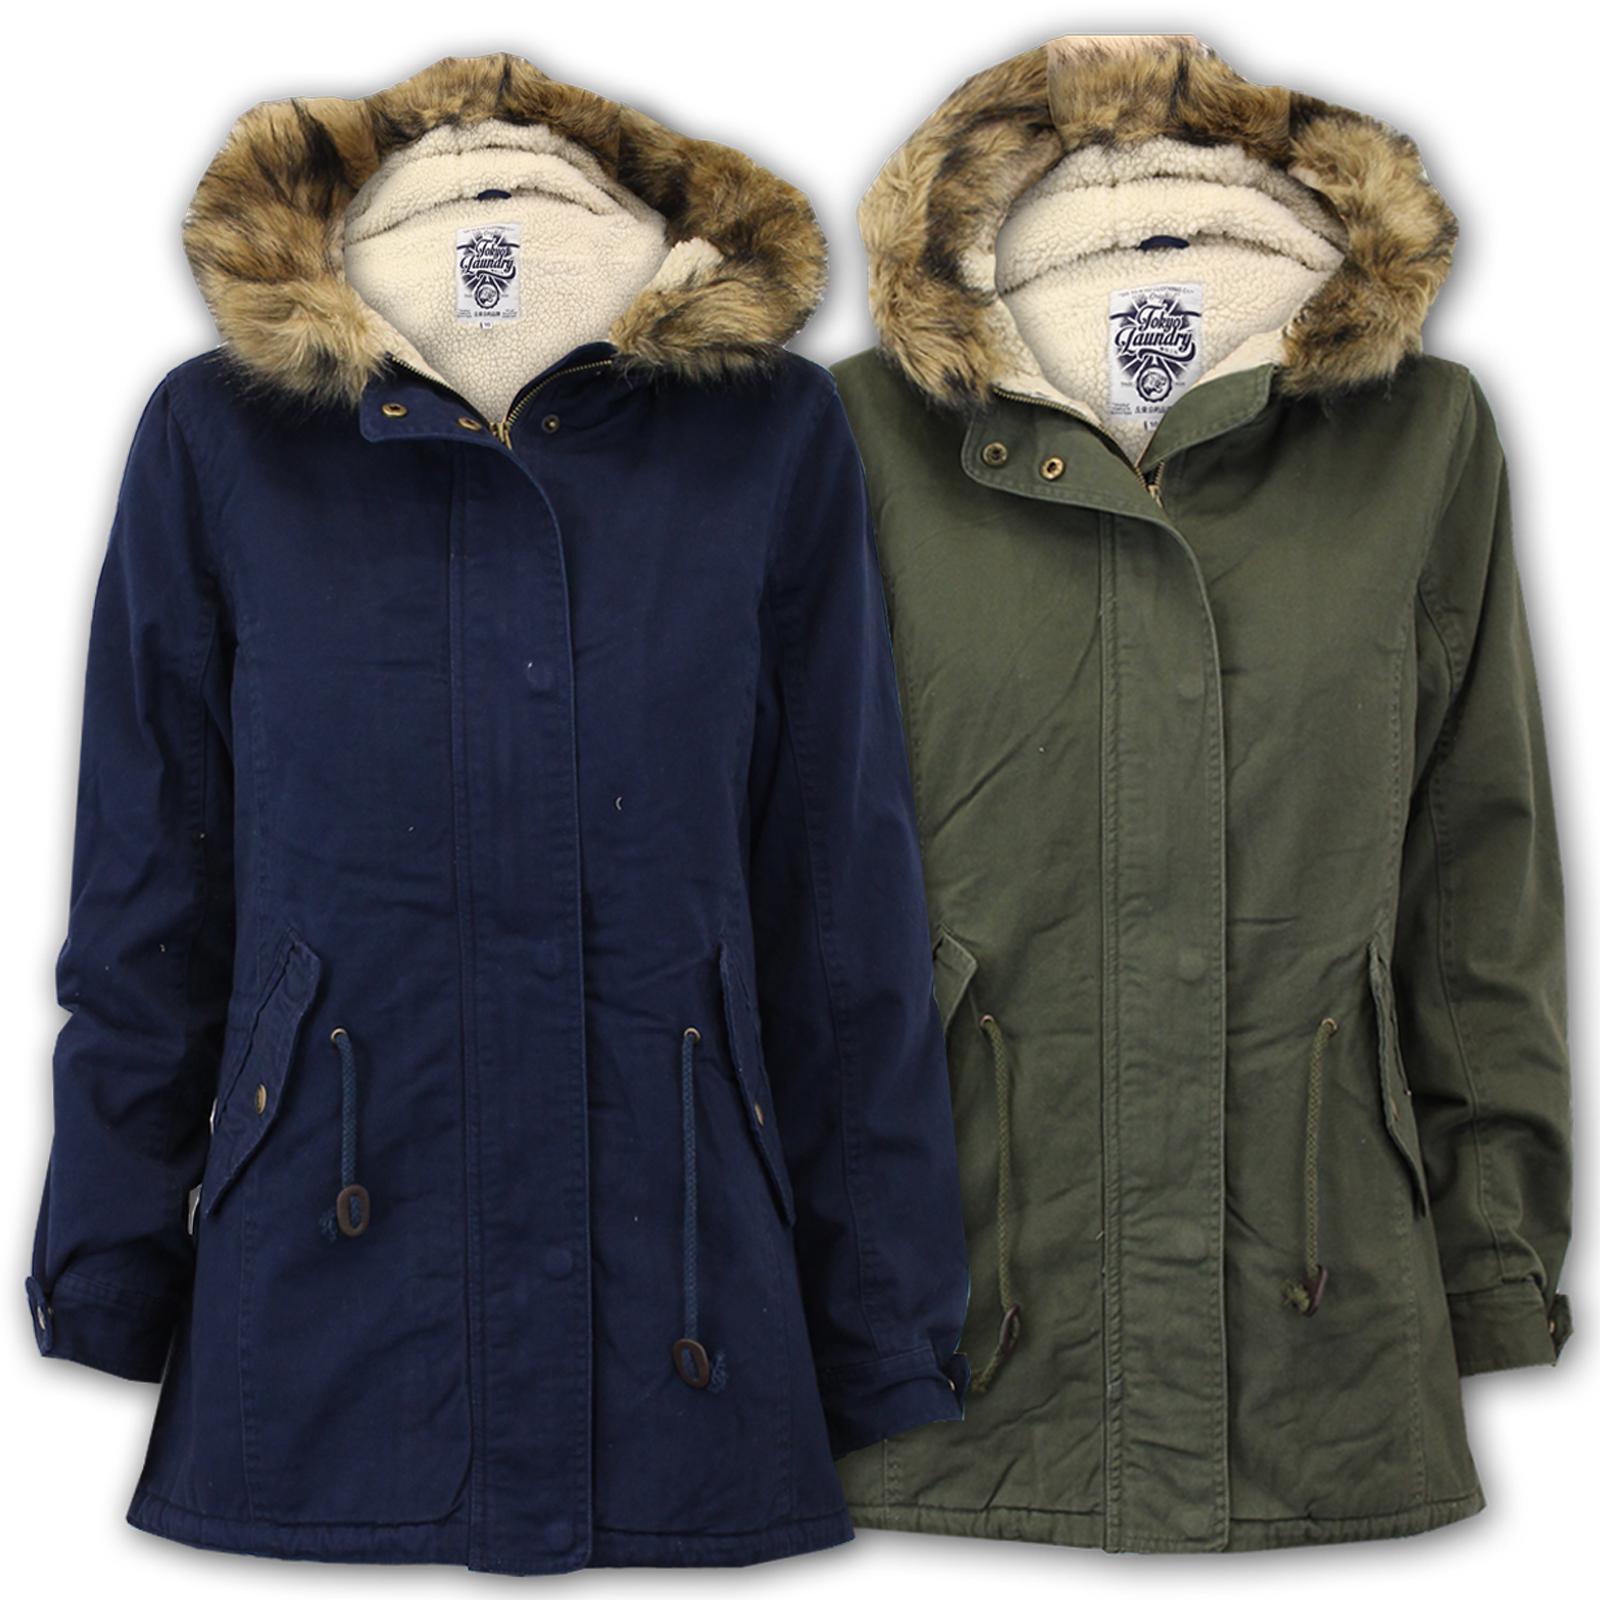 Ladies Fish Tail Parka Jackets Tokyo Laundry Coat Womens Hooded ...